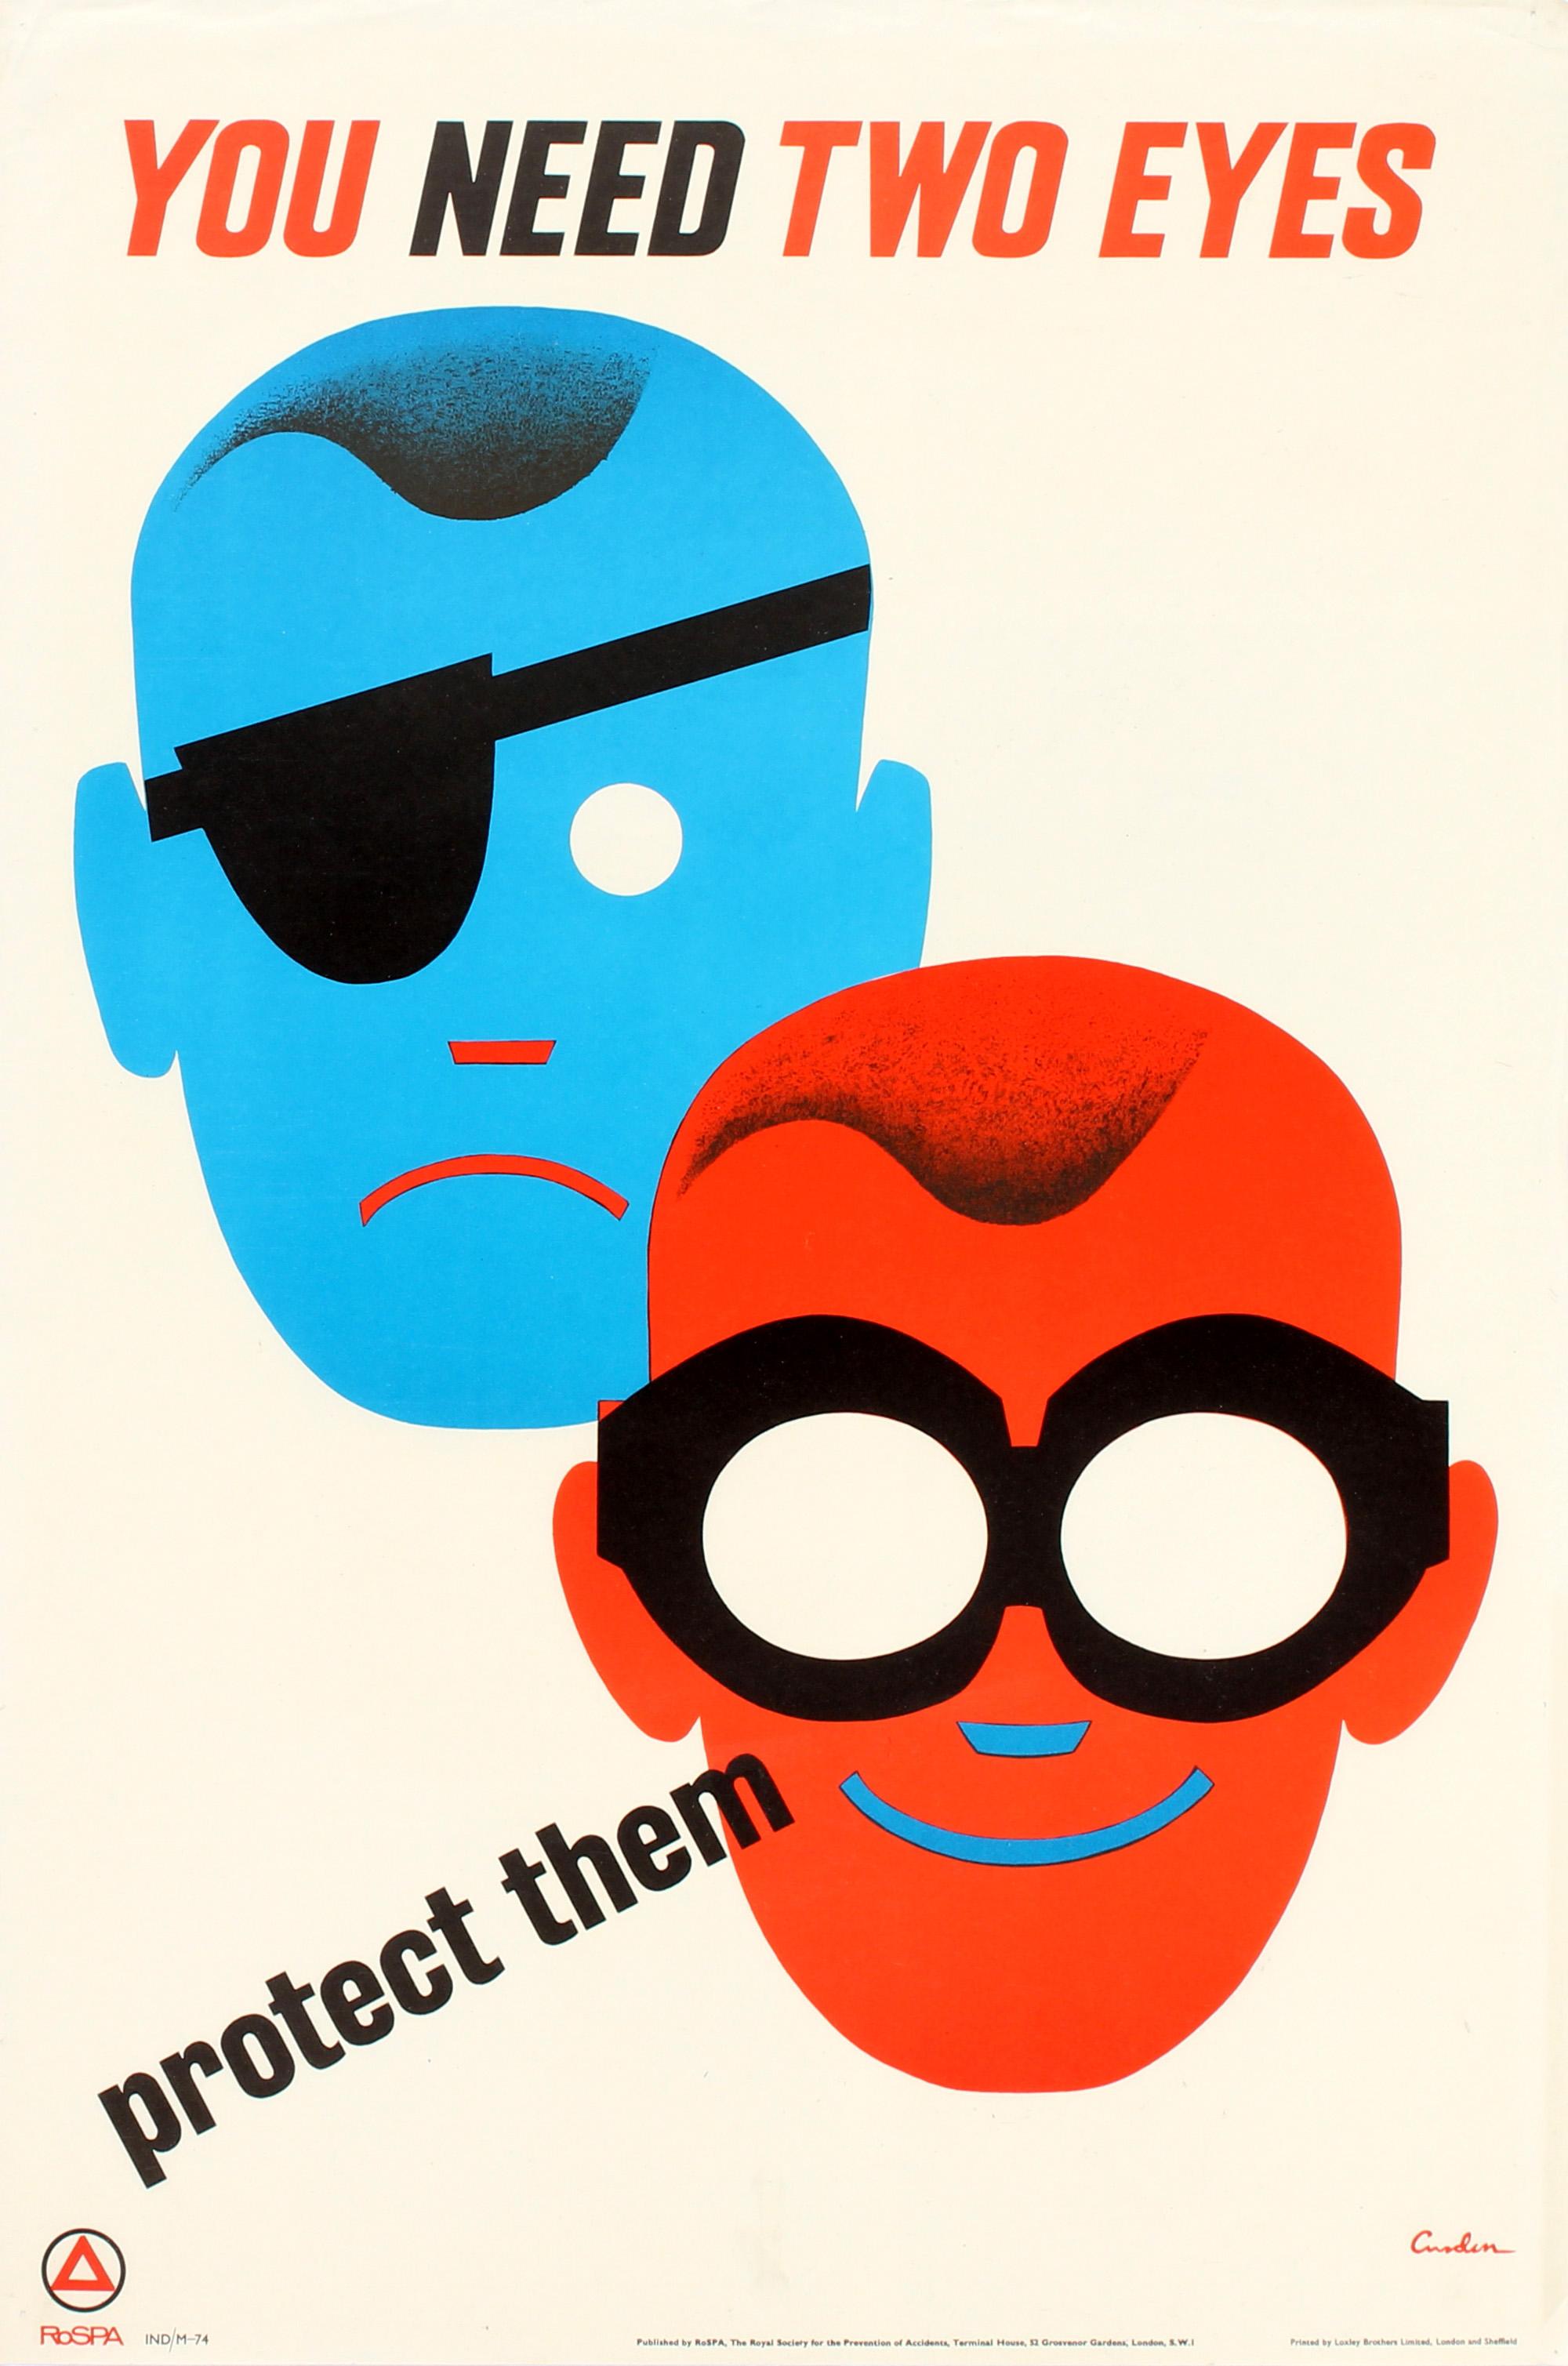 Lot 59 - Propaganda Poster You Need Two Eyes Eye Safety Goggles ROSPA